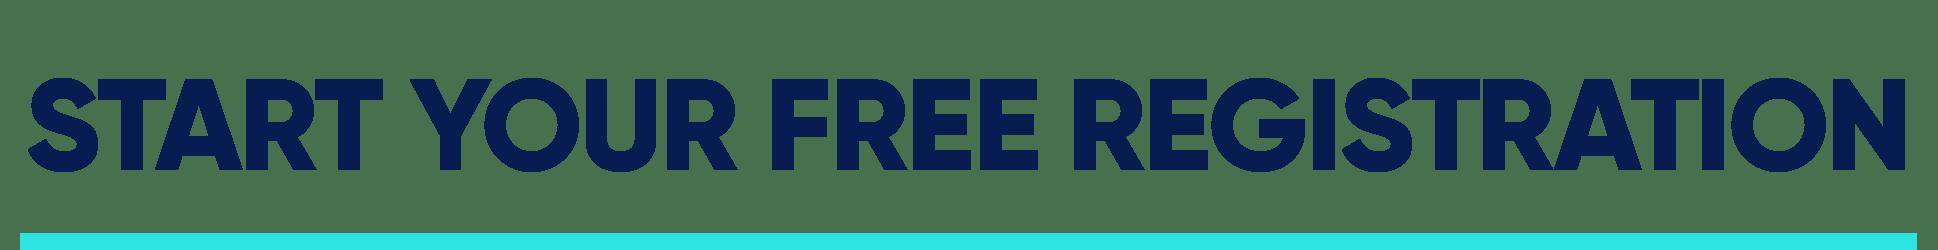 Start your free registration